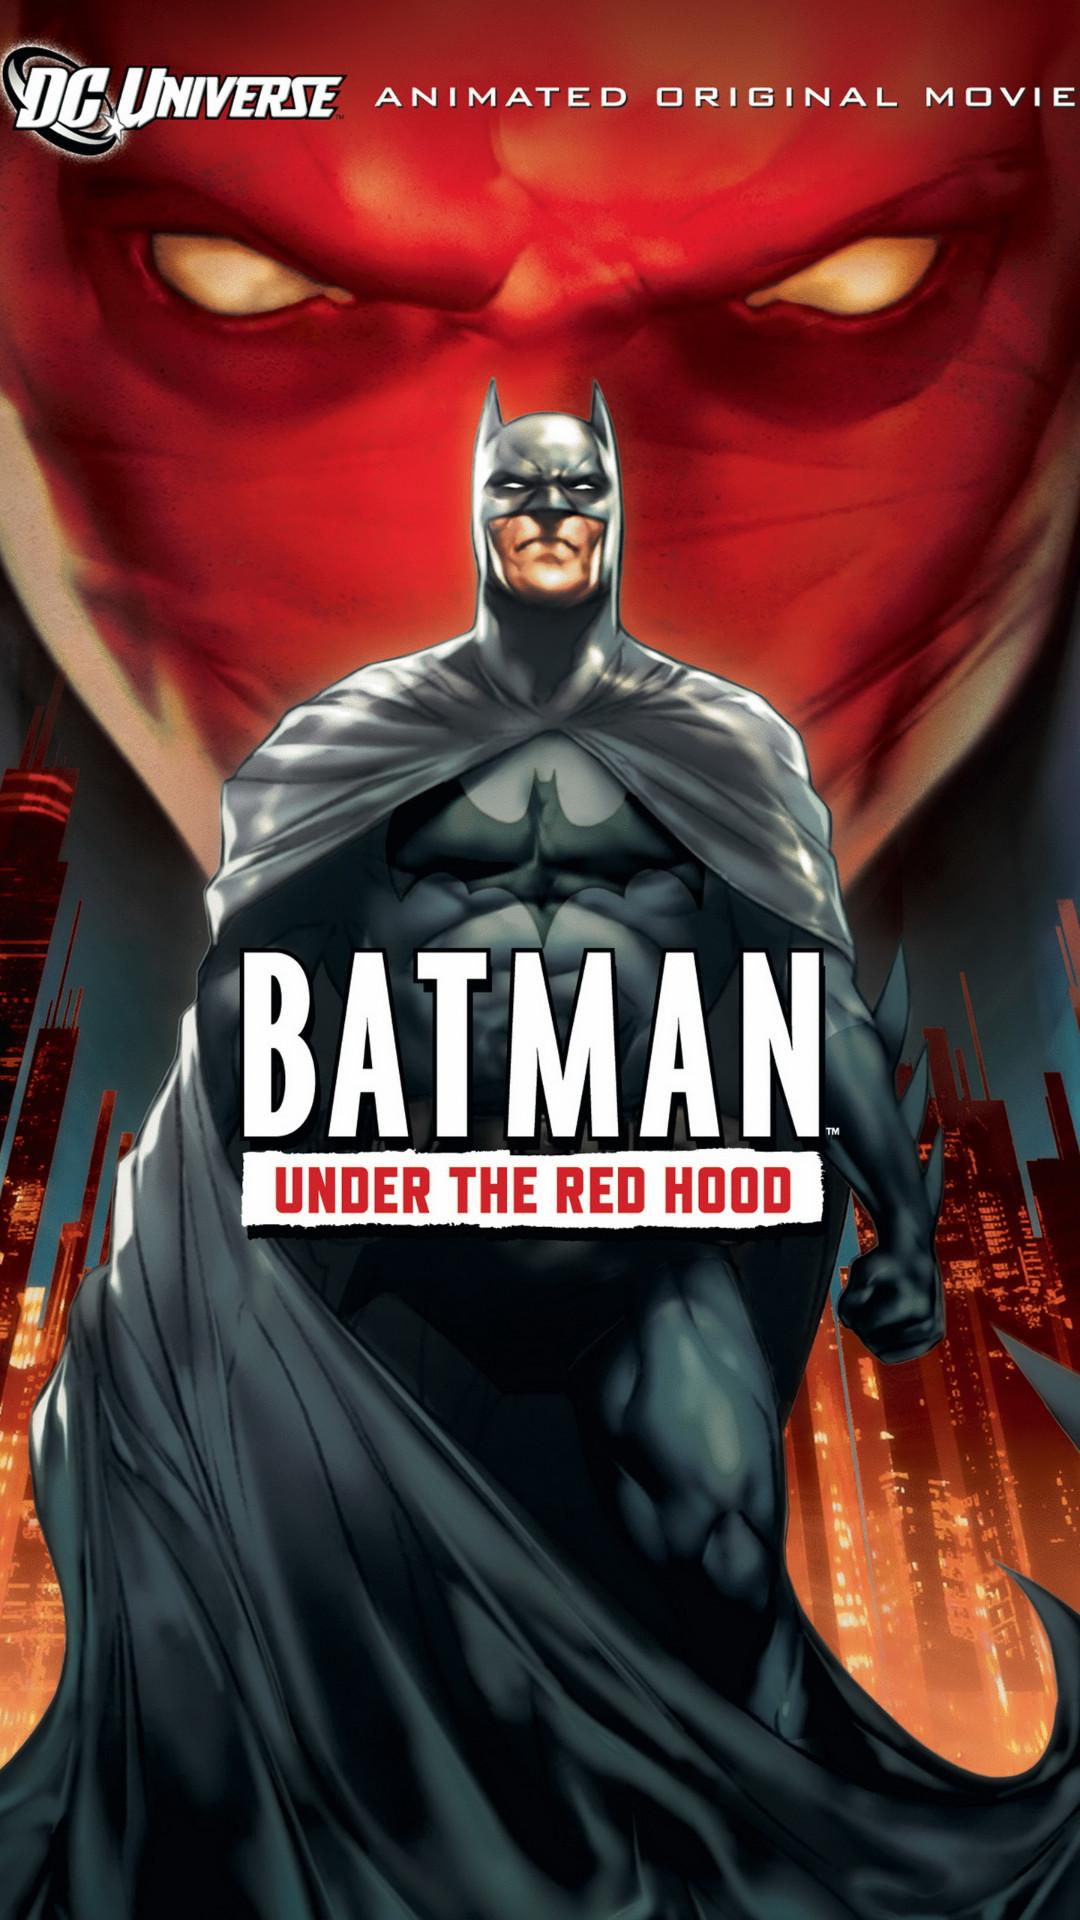 Batman – Under the Red Hood Galaxy S5 Wallpaper (1080×1920) | 1080 x 1920